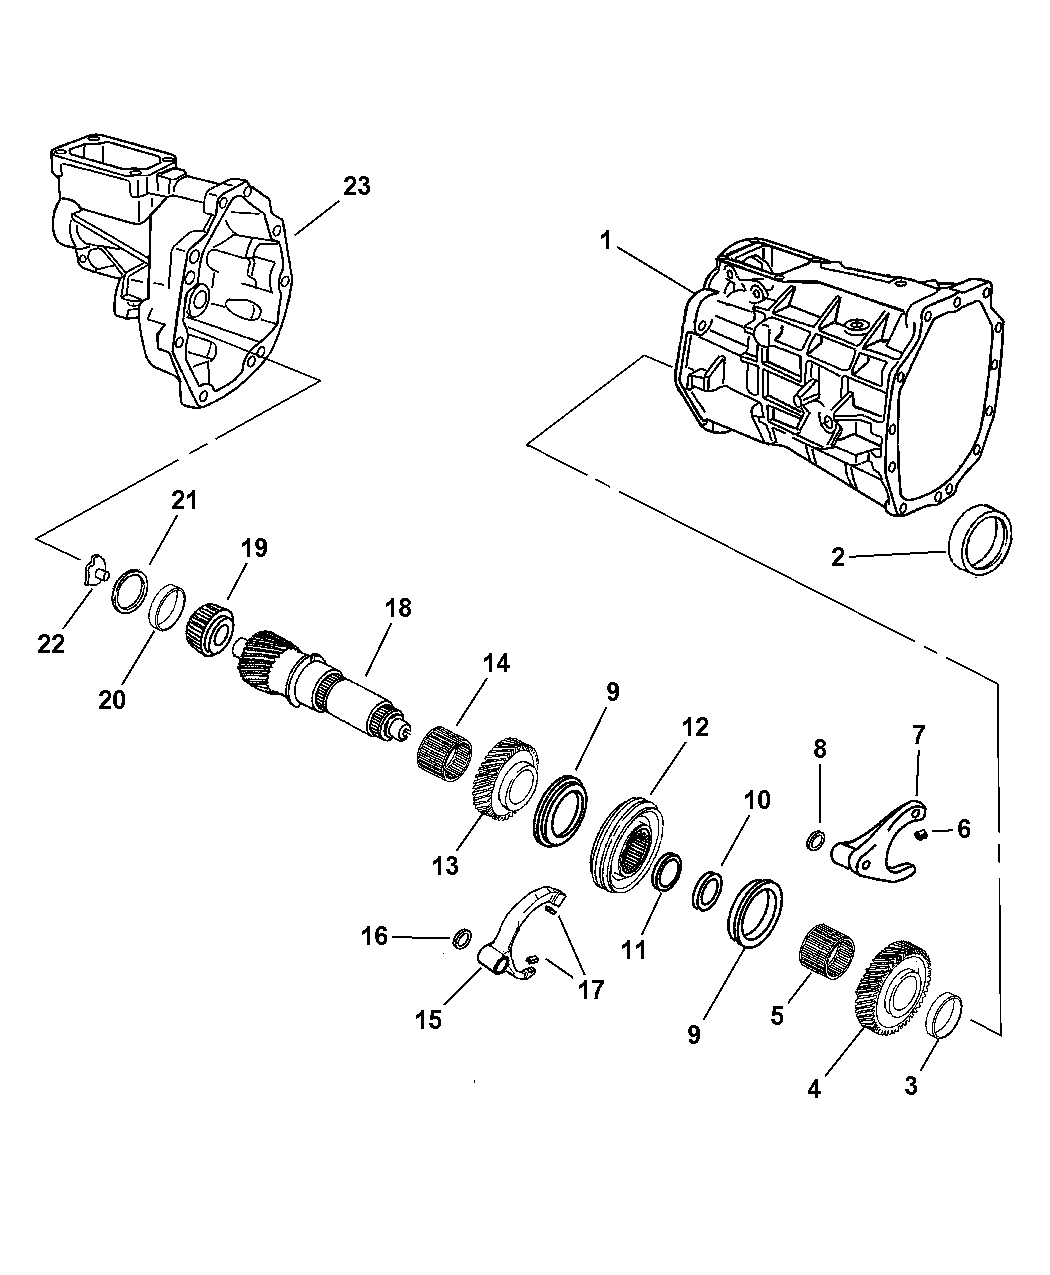 2006 dodge ram 1500 transmission parts diagram